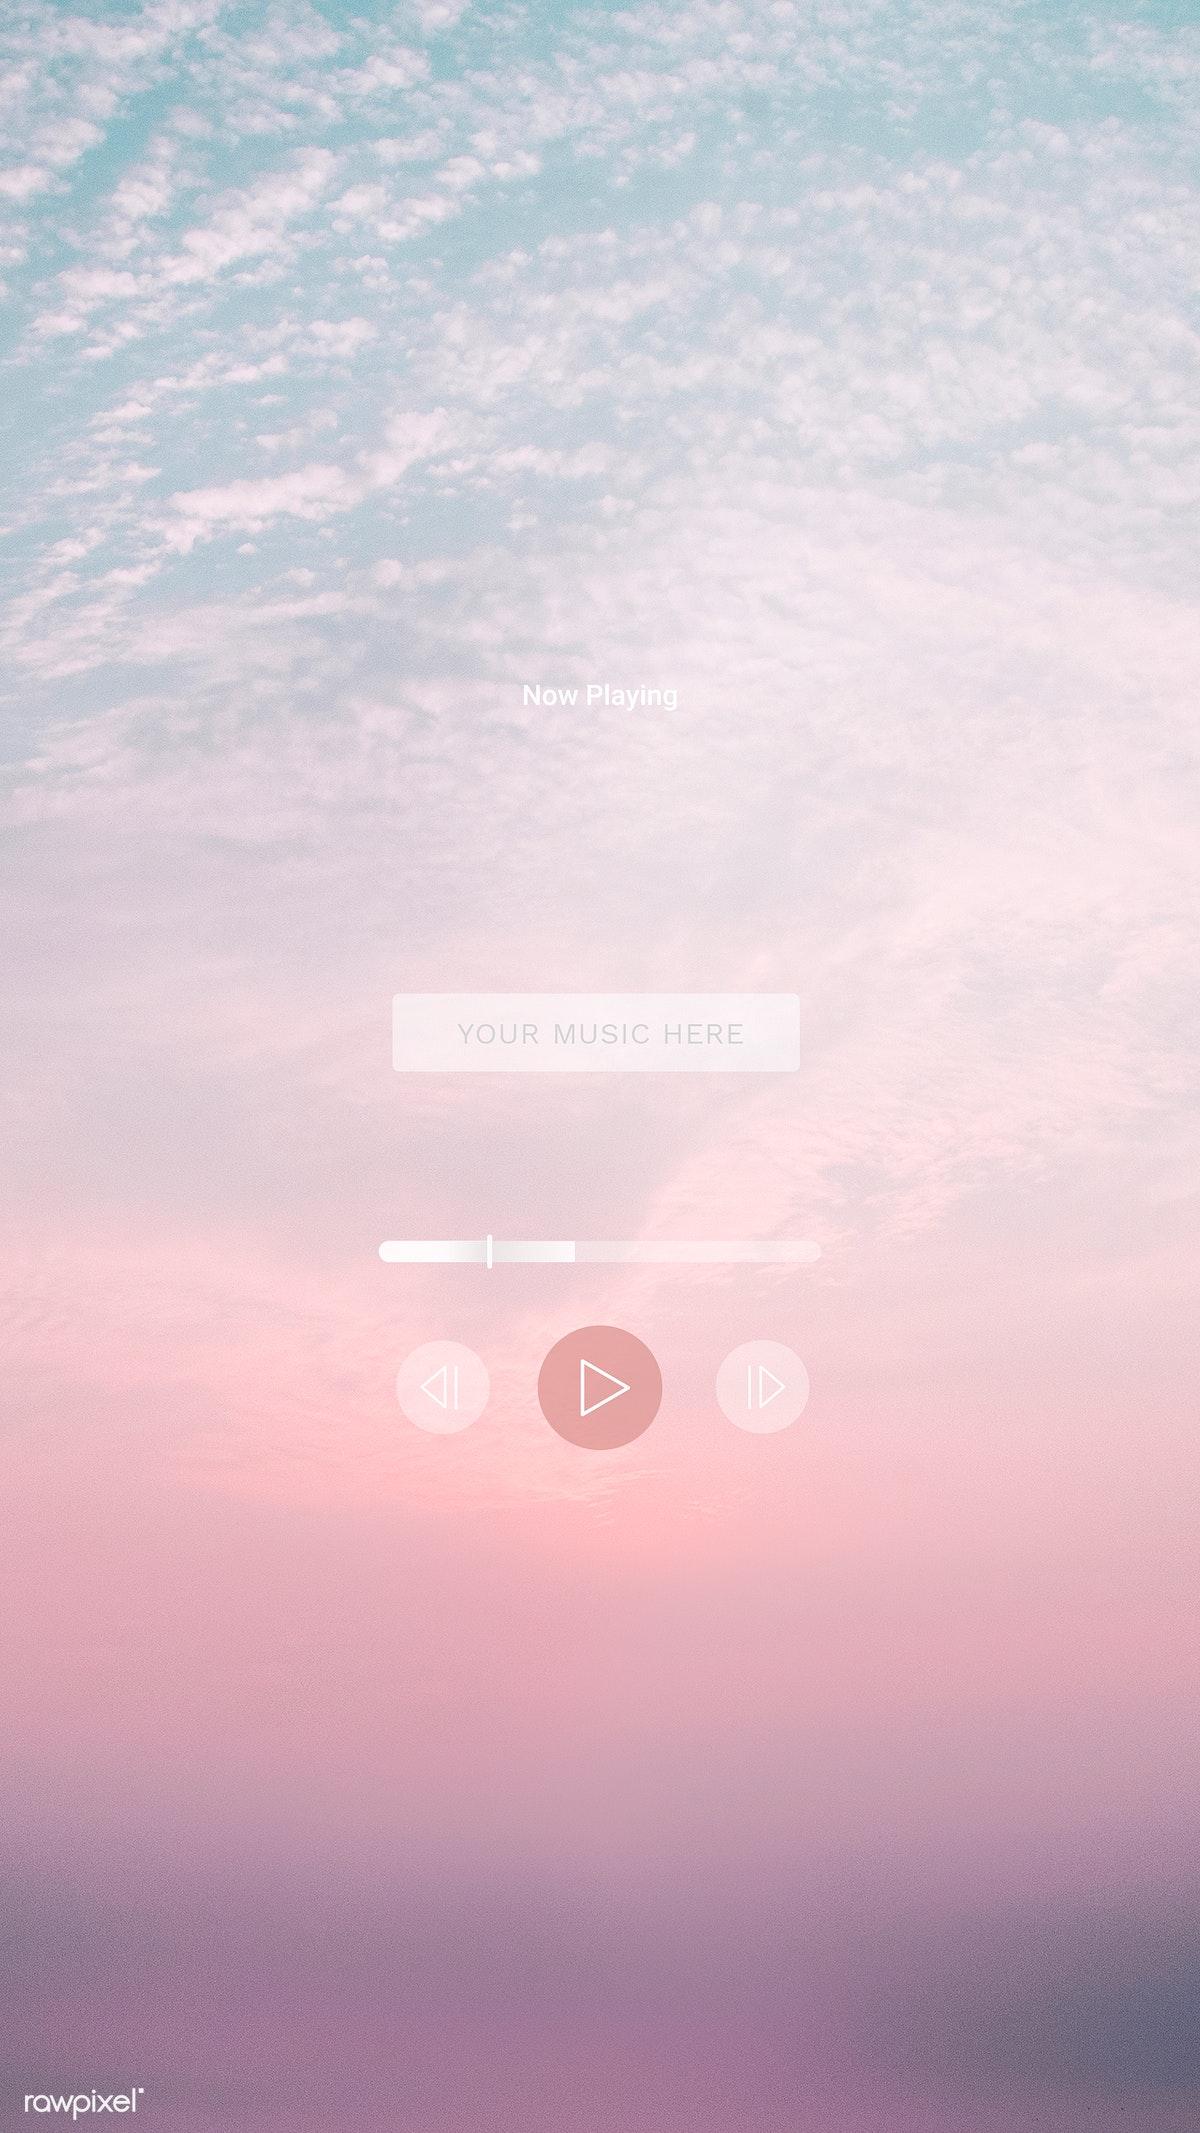 Download premium image of Music playing mobile phone wallpaper 1214200